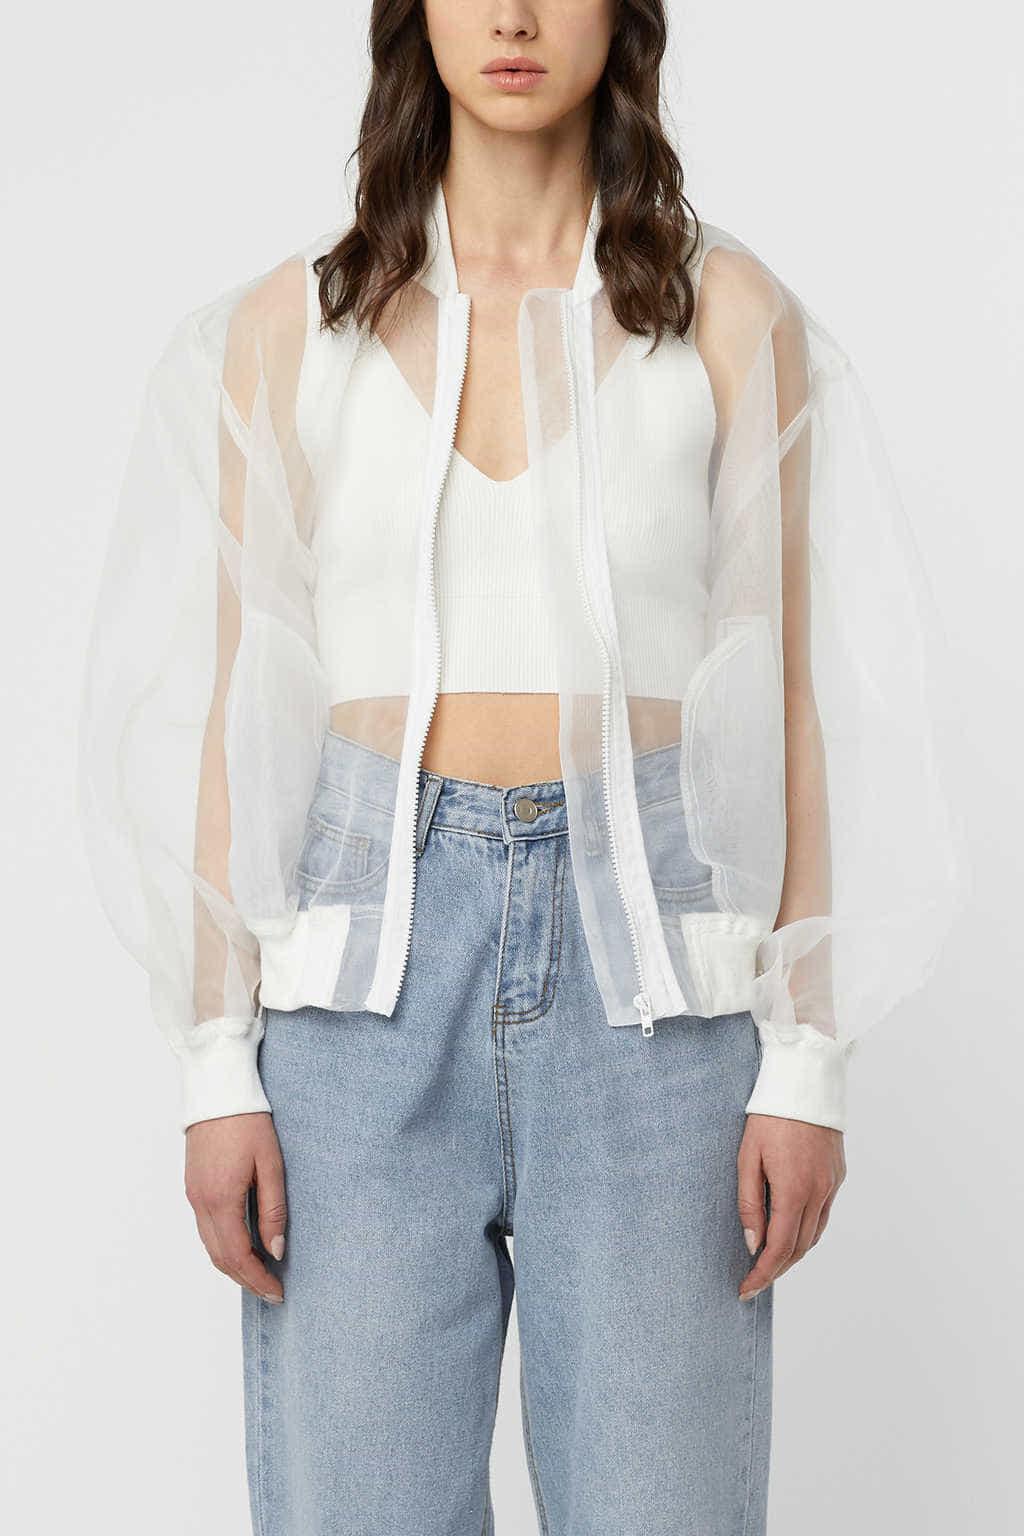 Jacket K007 Cream 2